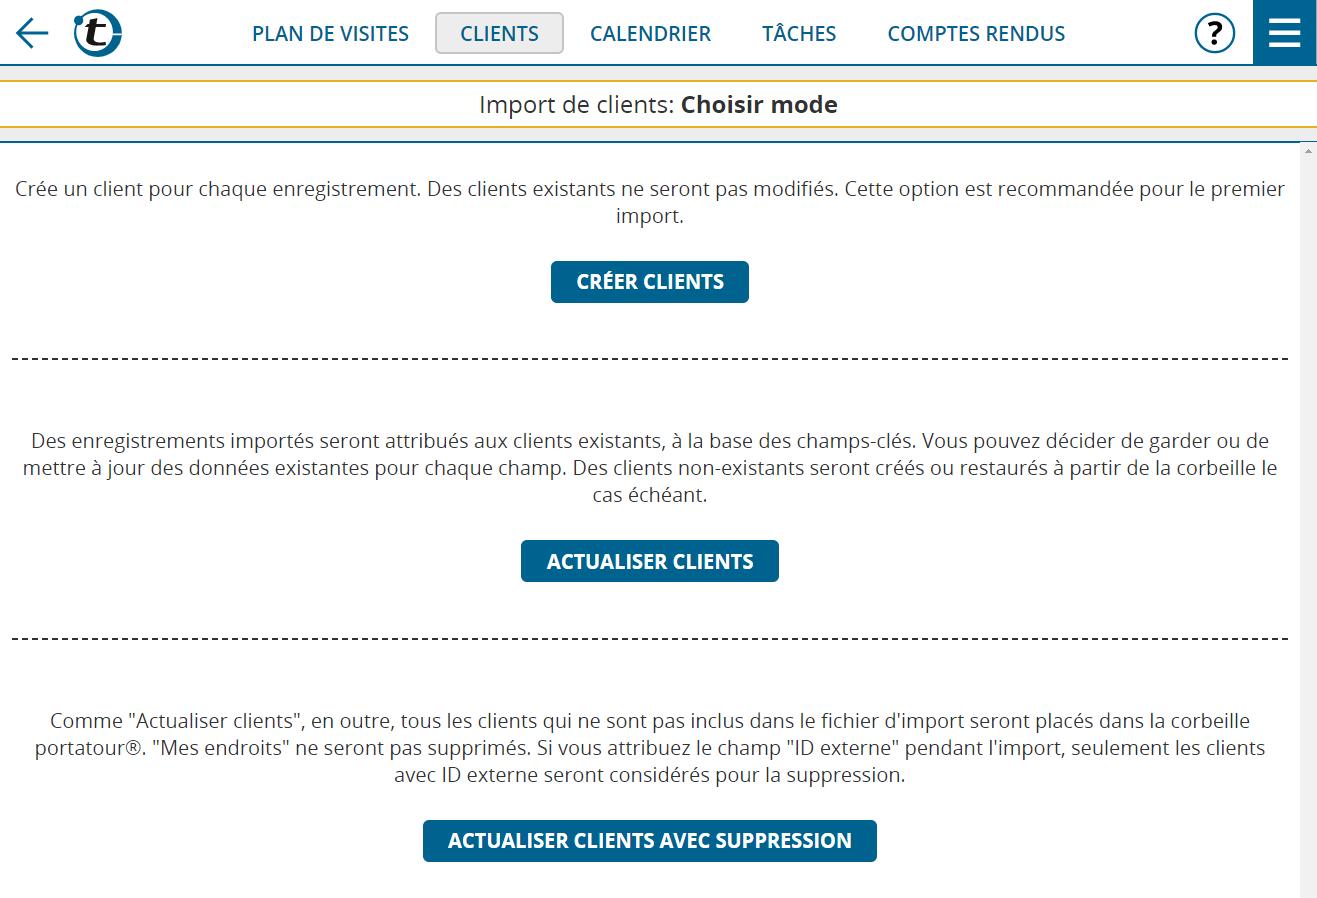 customerimport-choose-mode-fr.png